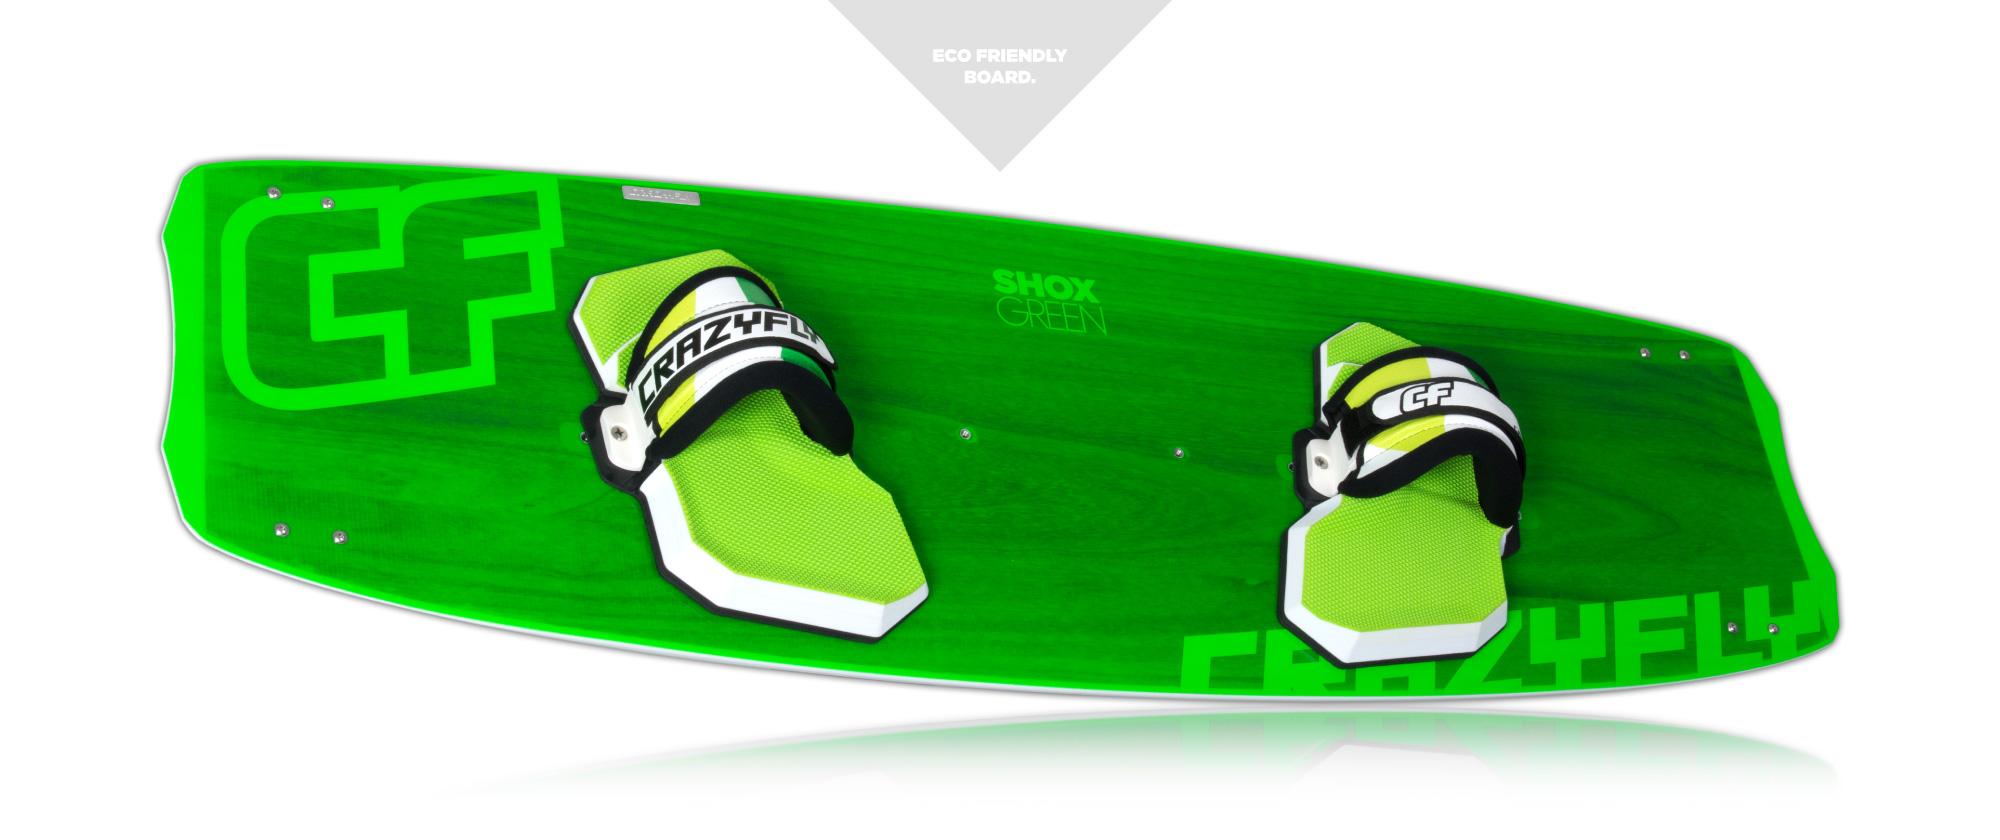 shox-green-1